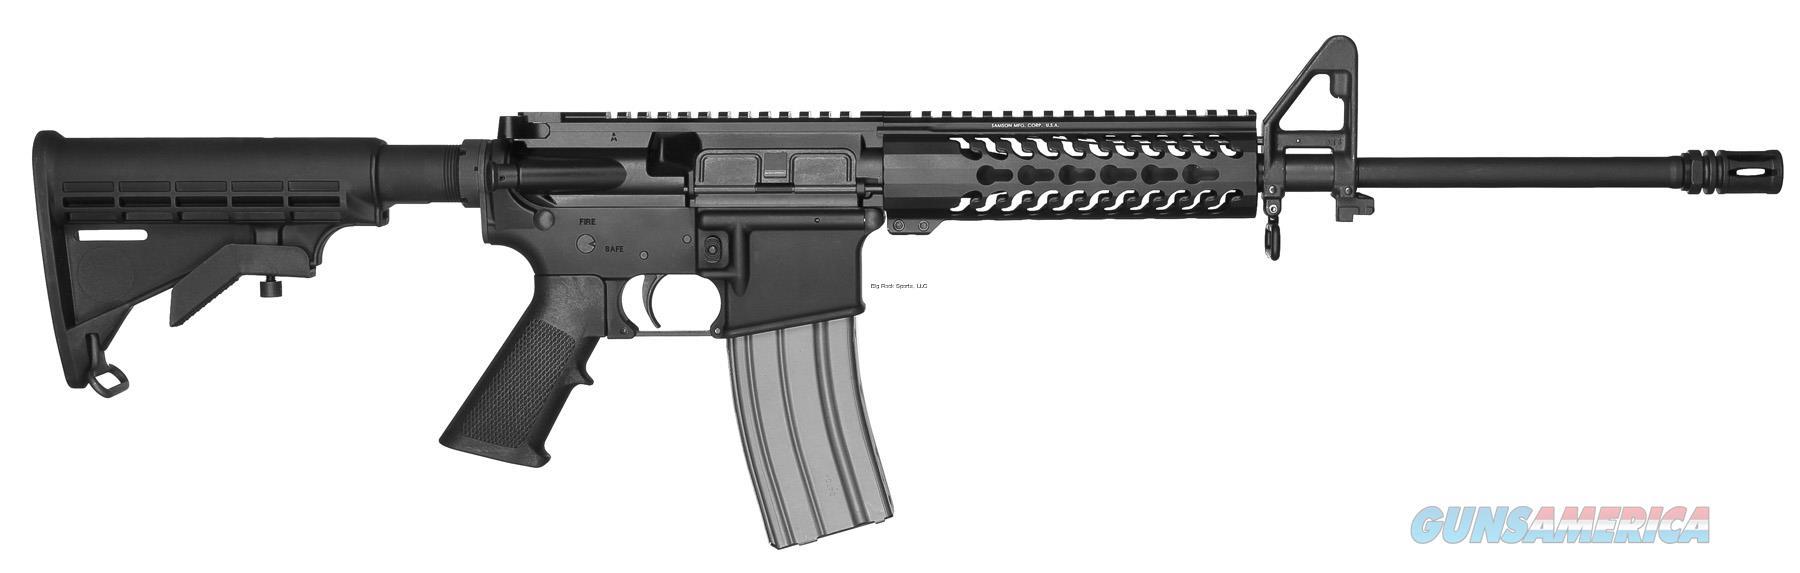 "Delton Echo 316L A3 Keymod 5.56Mm 16"" Bbl. 30Rd Black RFTLW16-O  Guns > Rifles > D Misc Rifles"